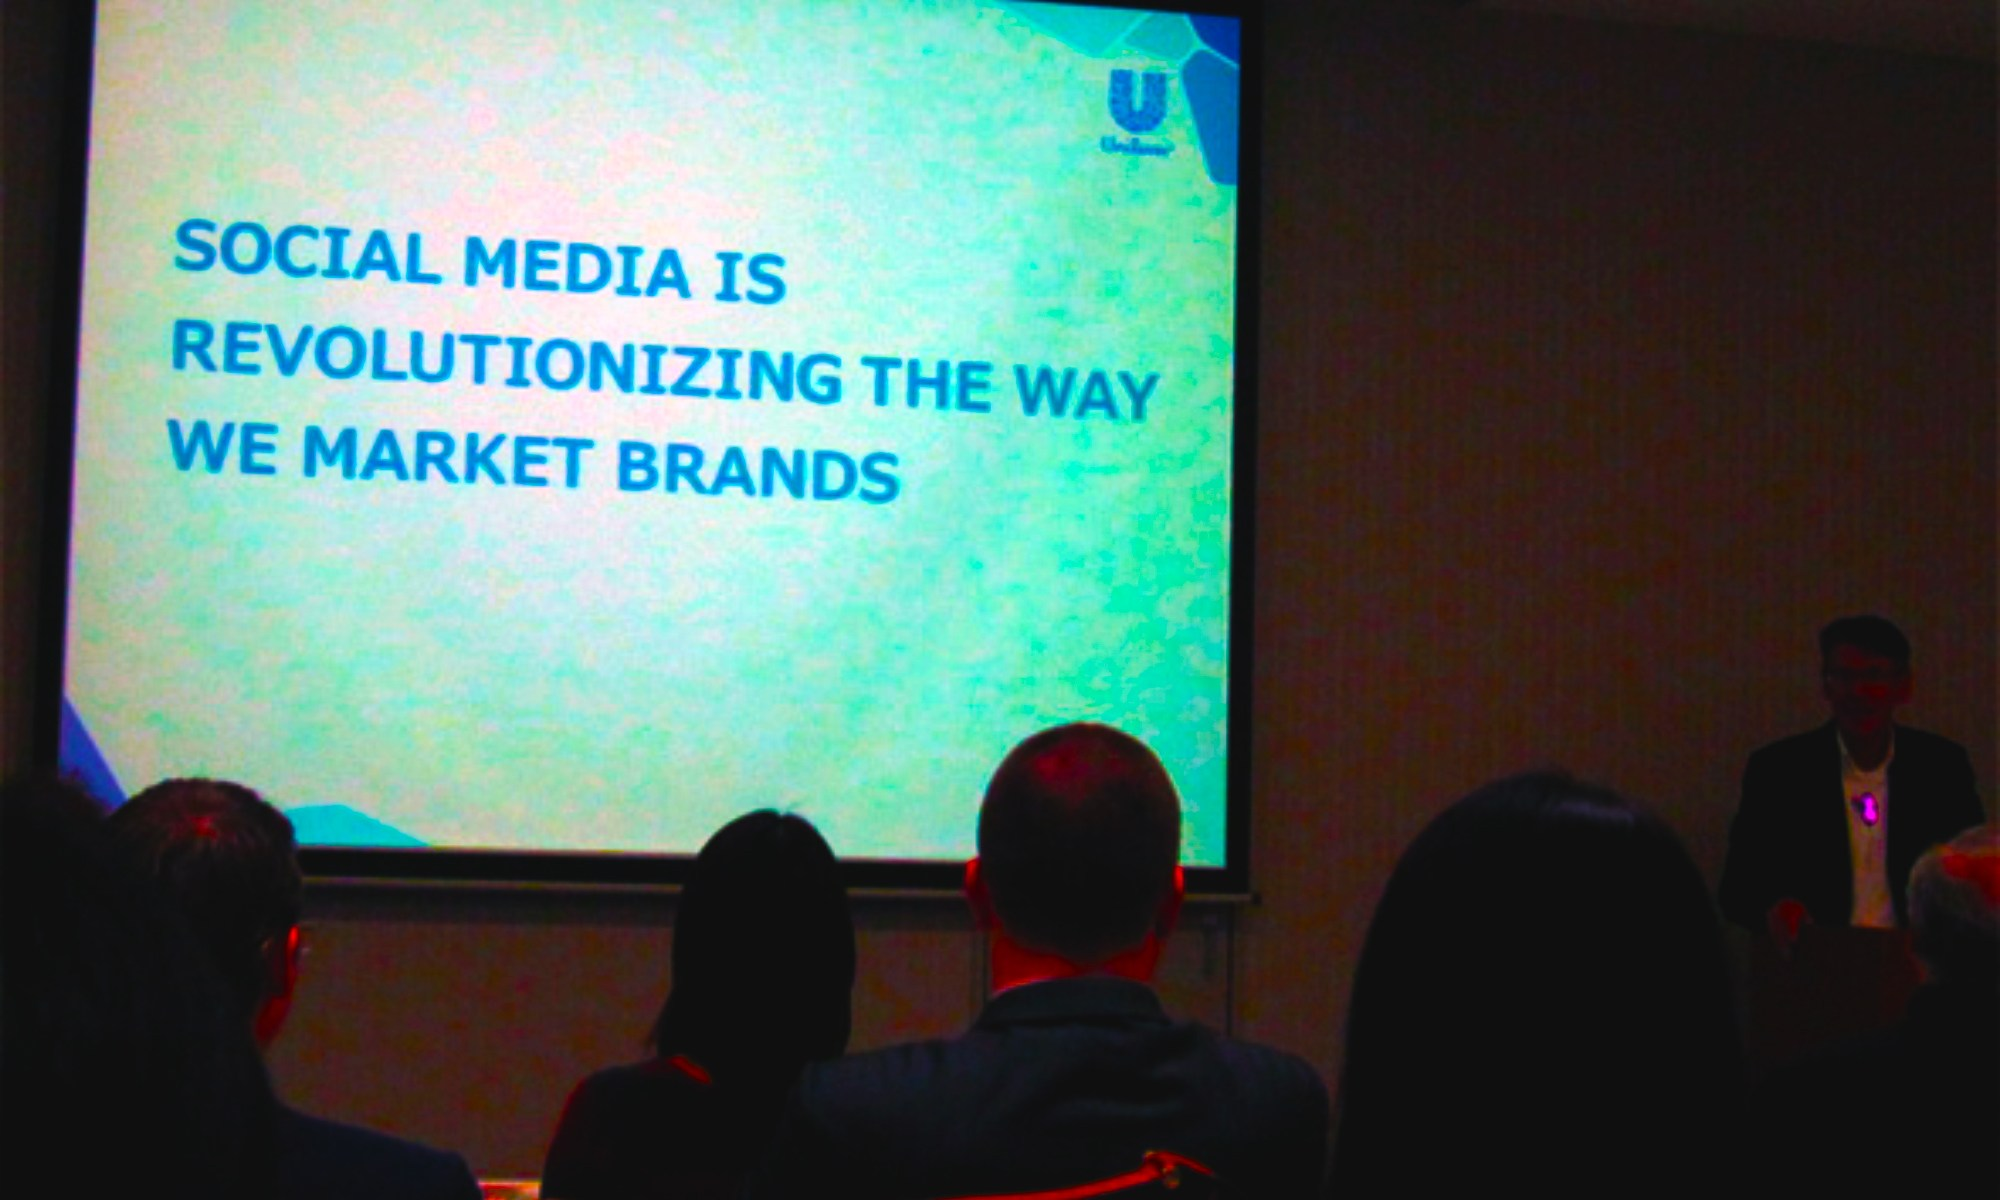 Social media revolutionize how we market brands (Ray Bremner, President & CEO, Unilever Japan)